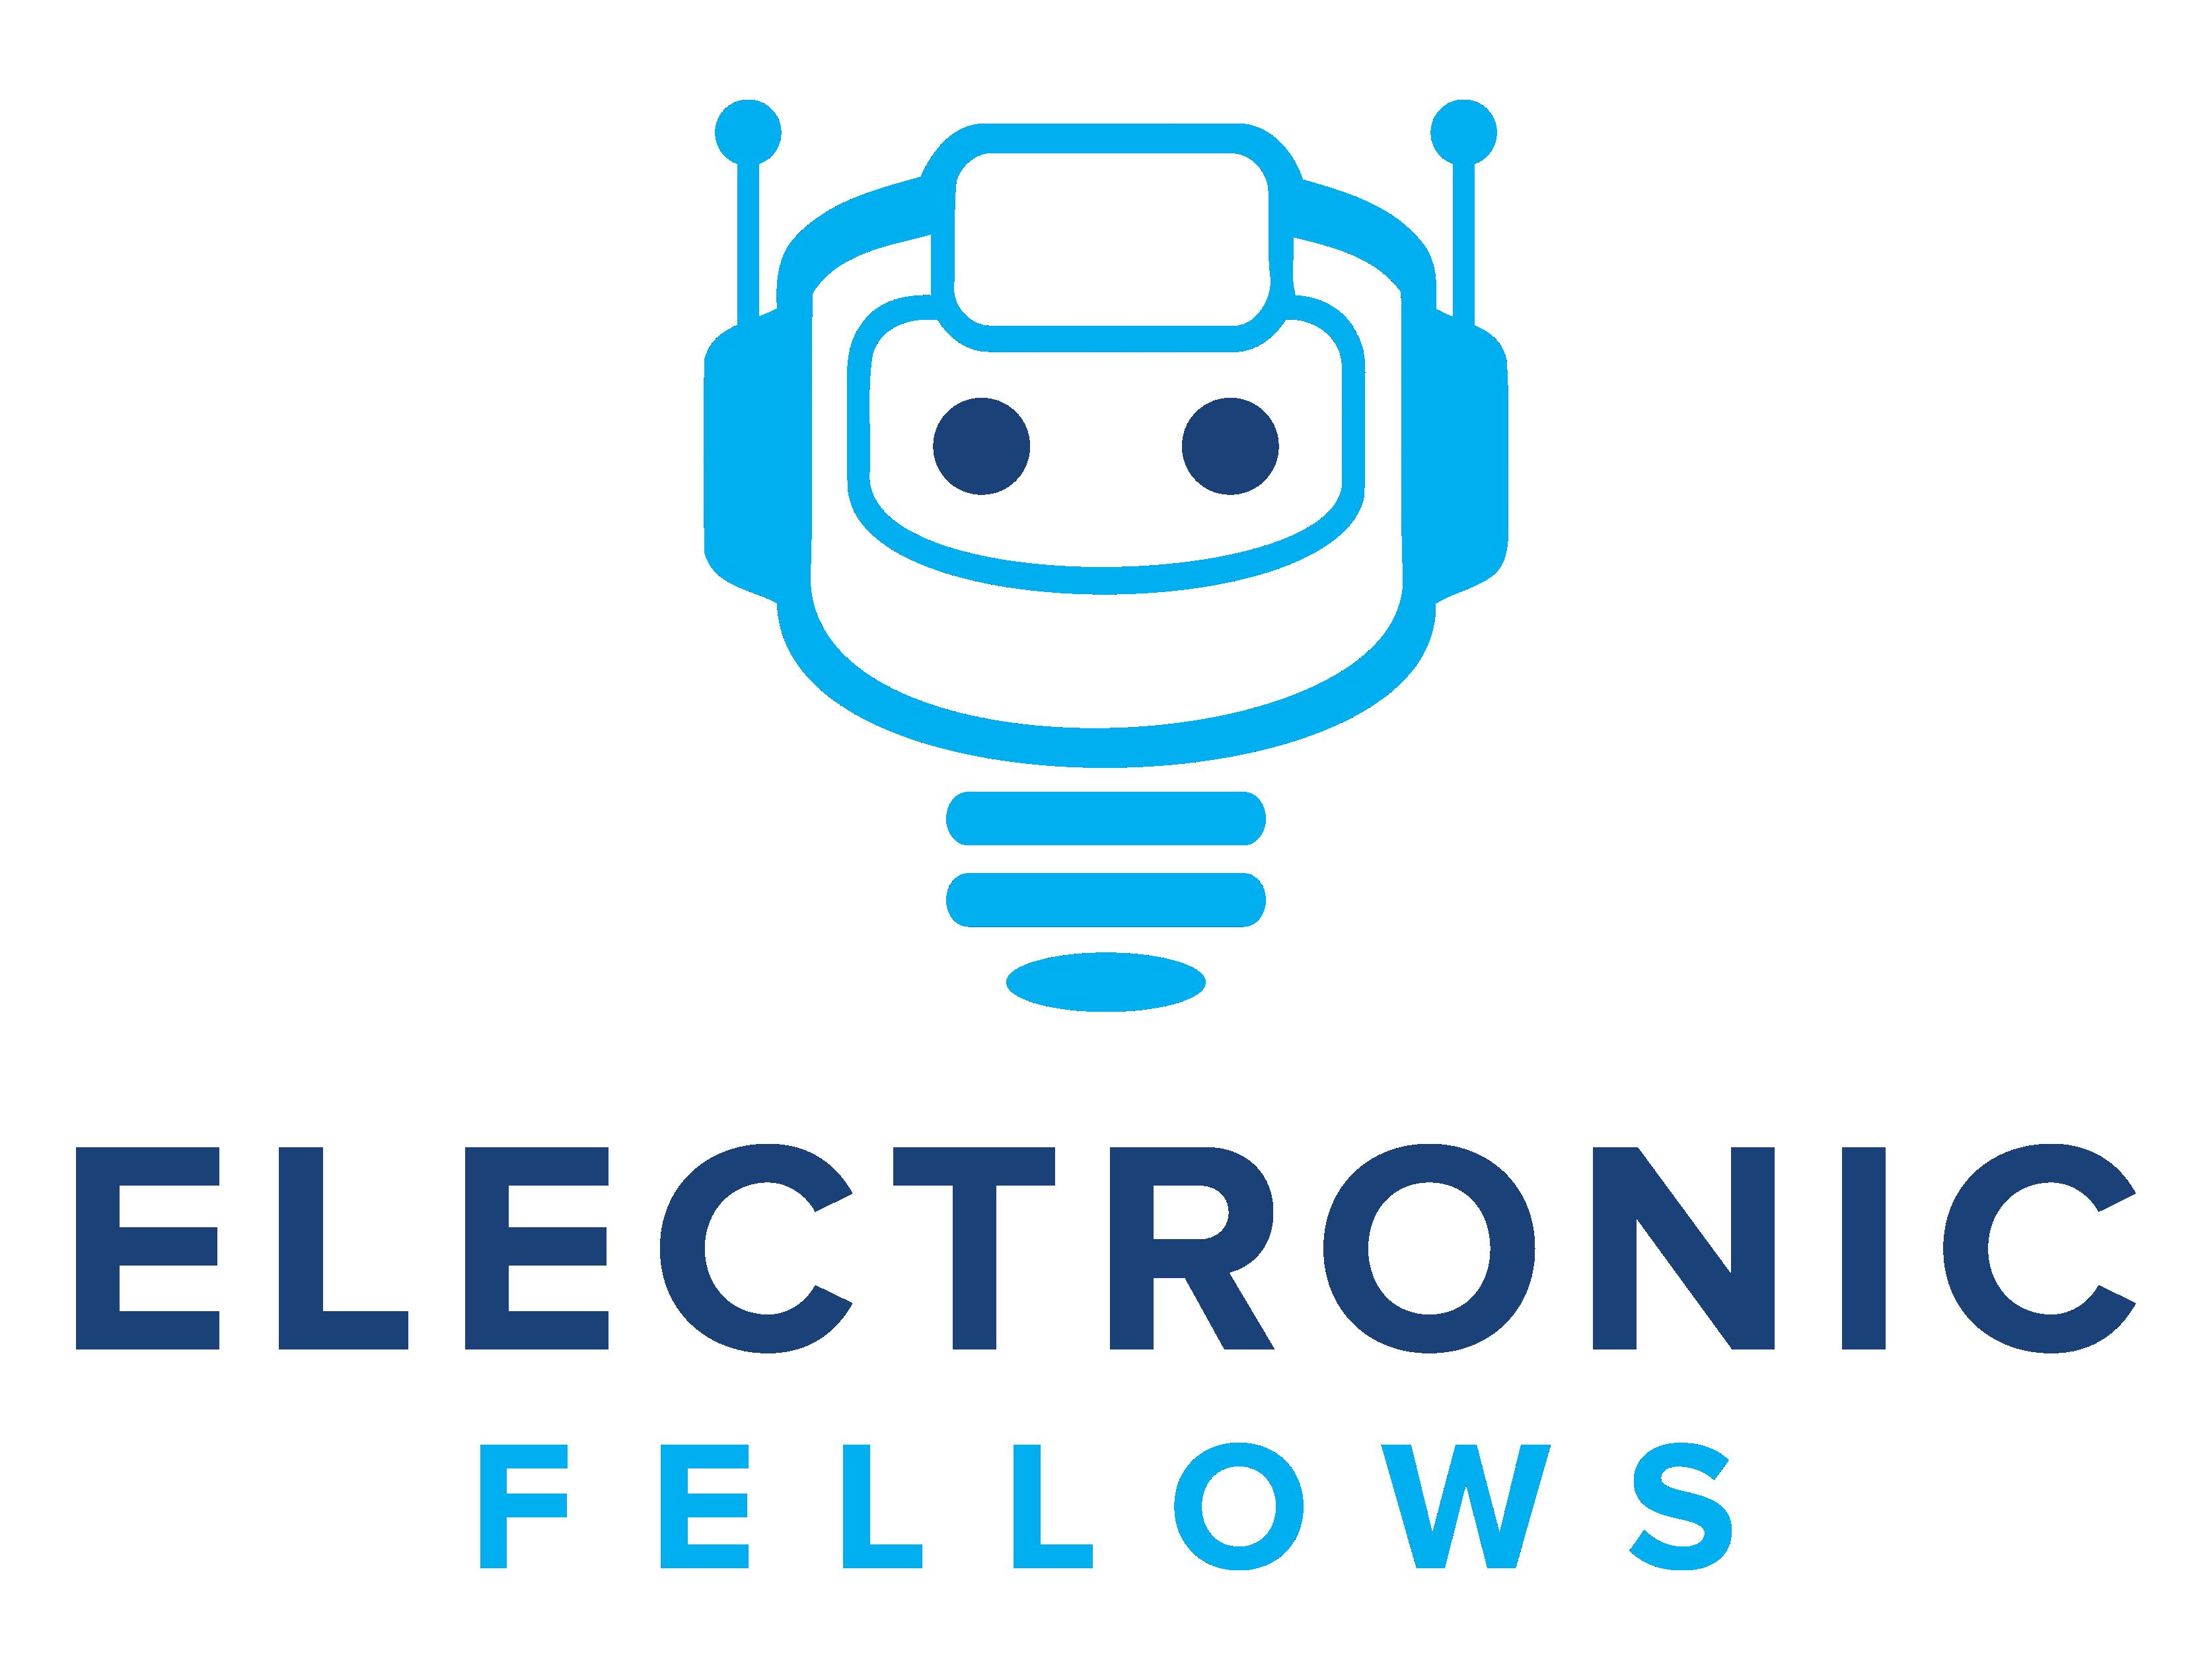 Electronic Fellows